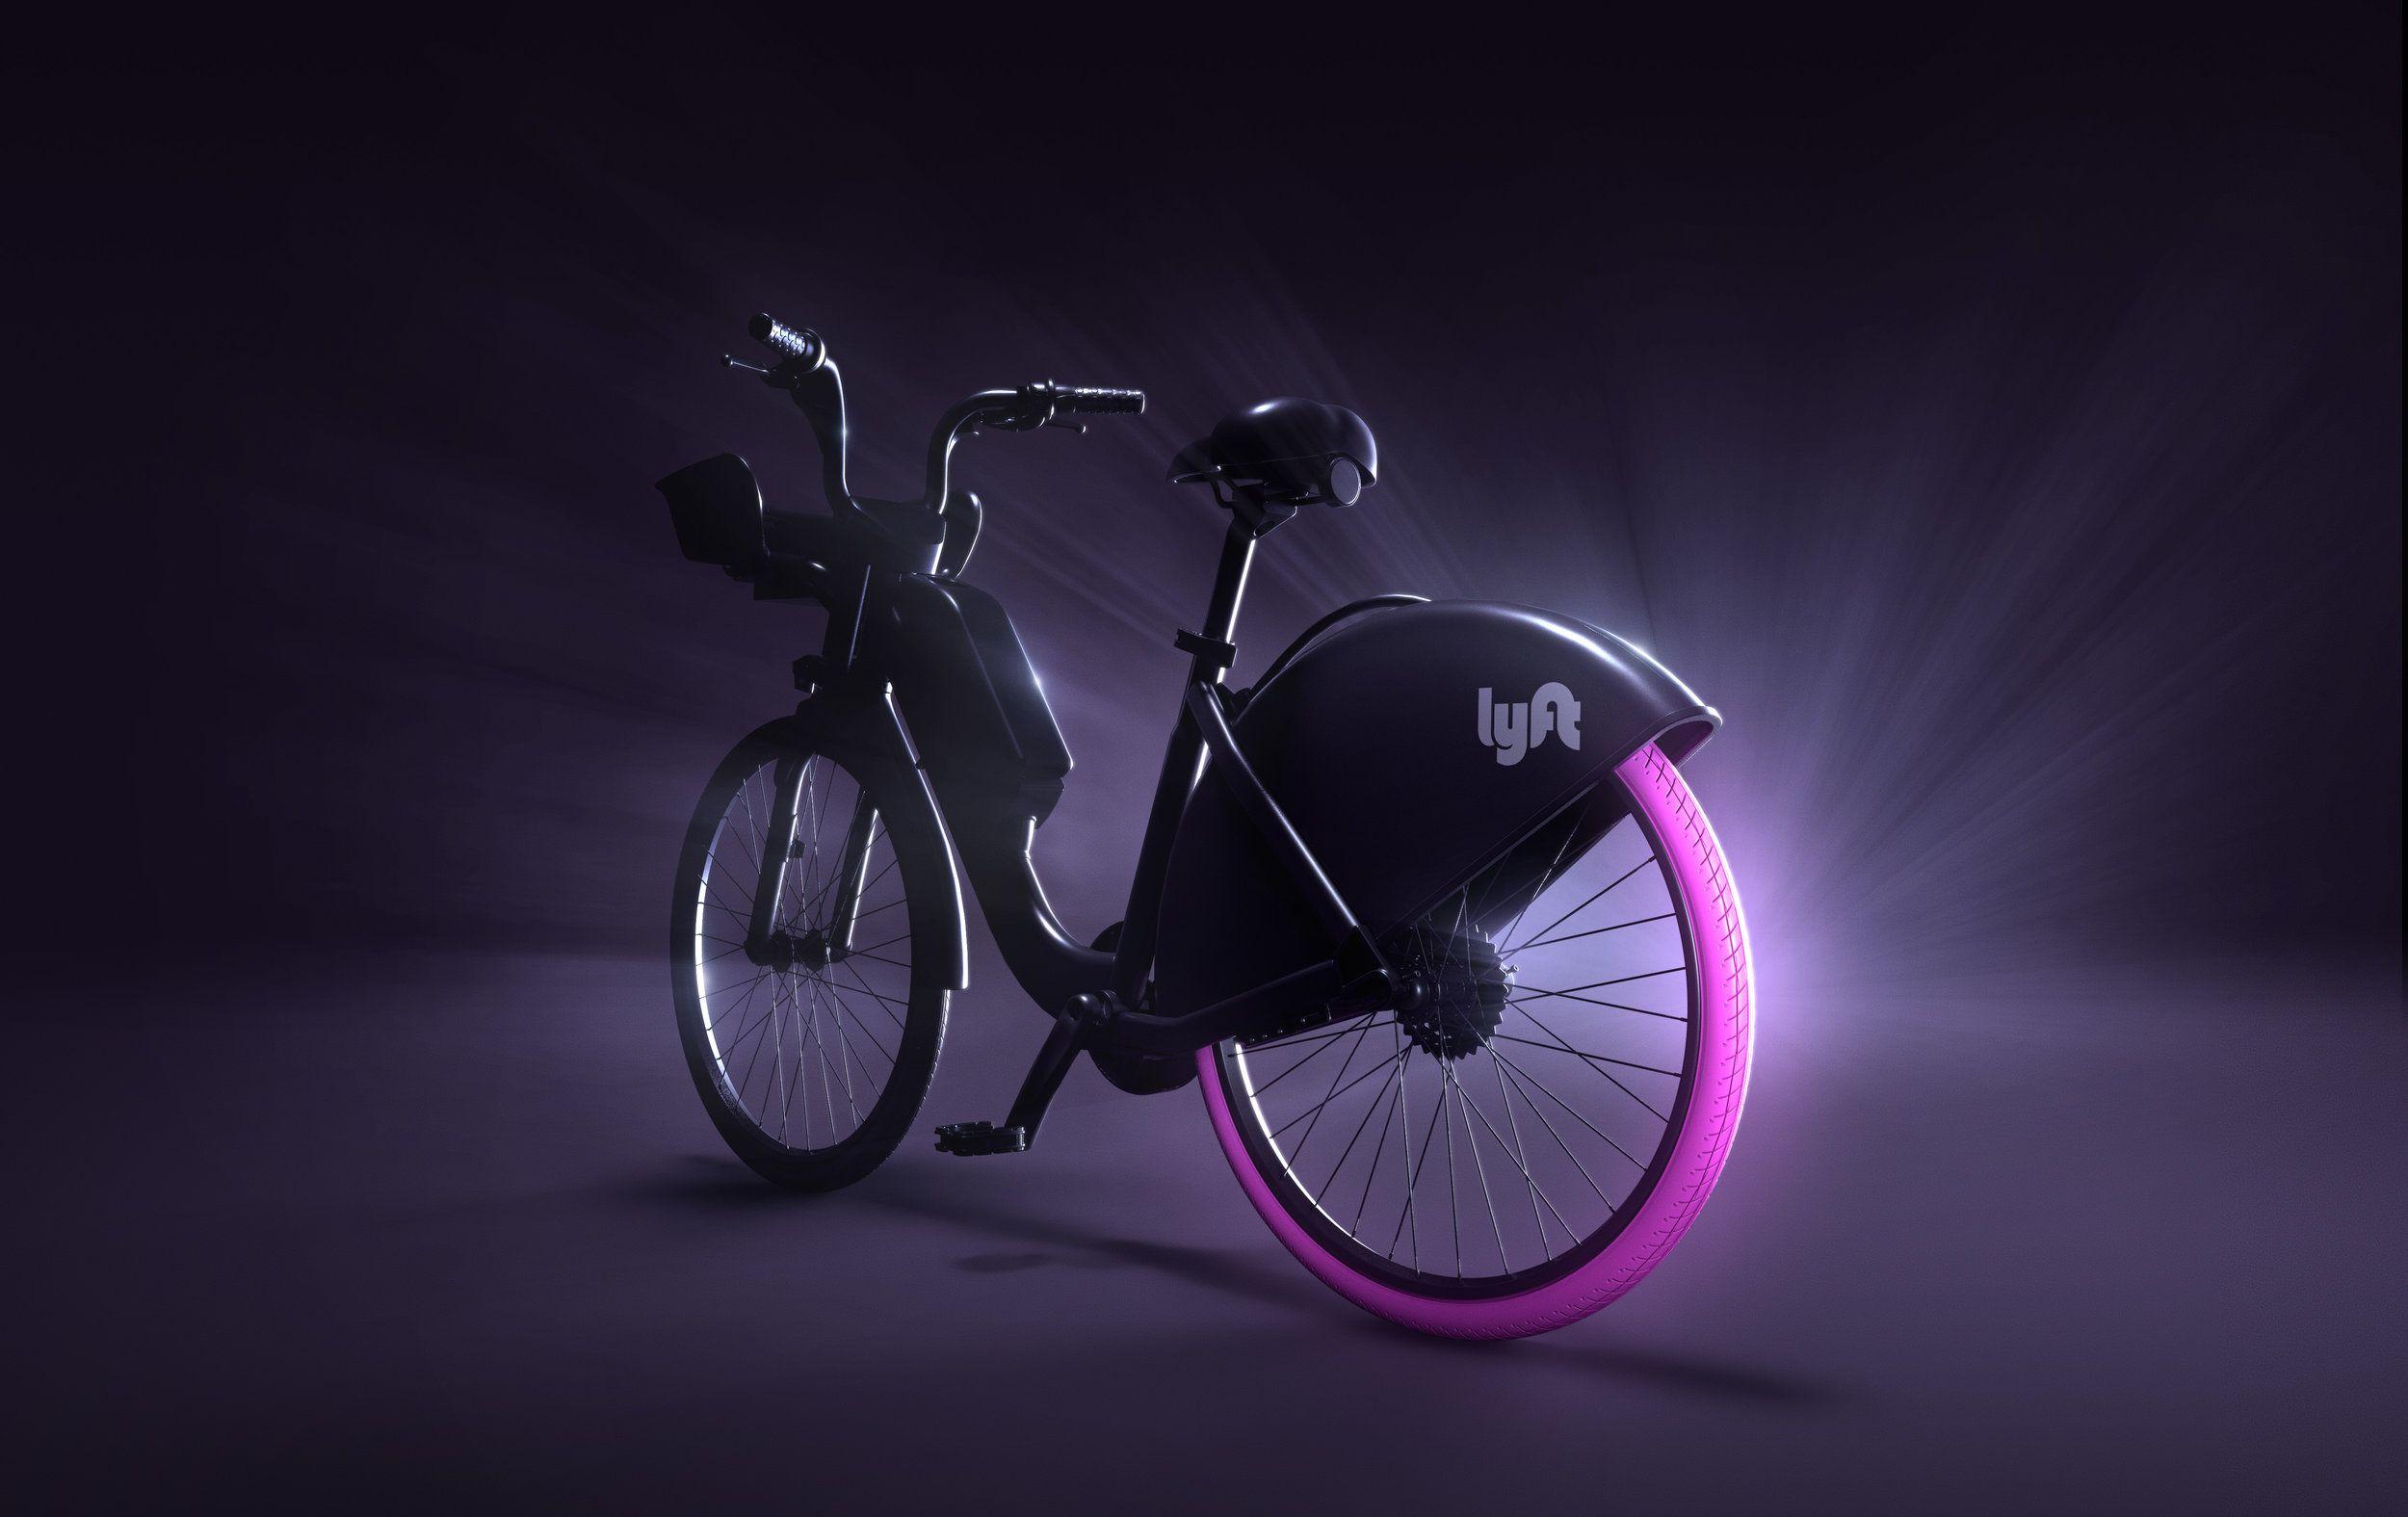 https://www bicycling com/news/a25361114/lyft-buys-countrys